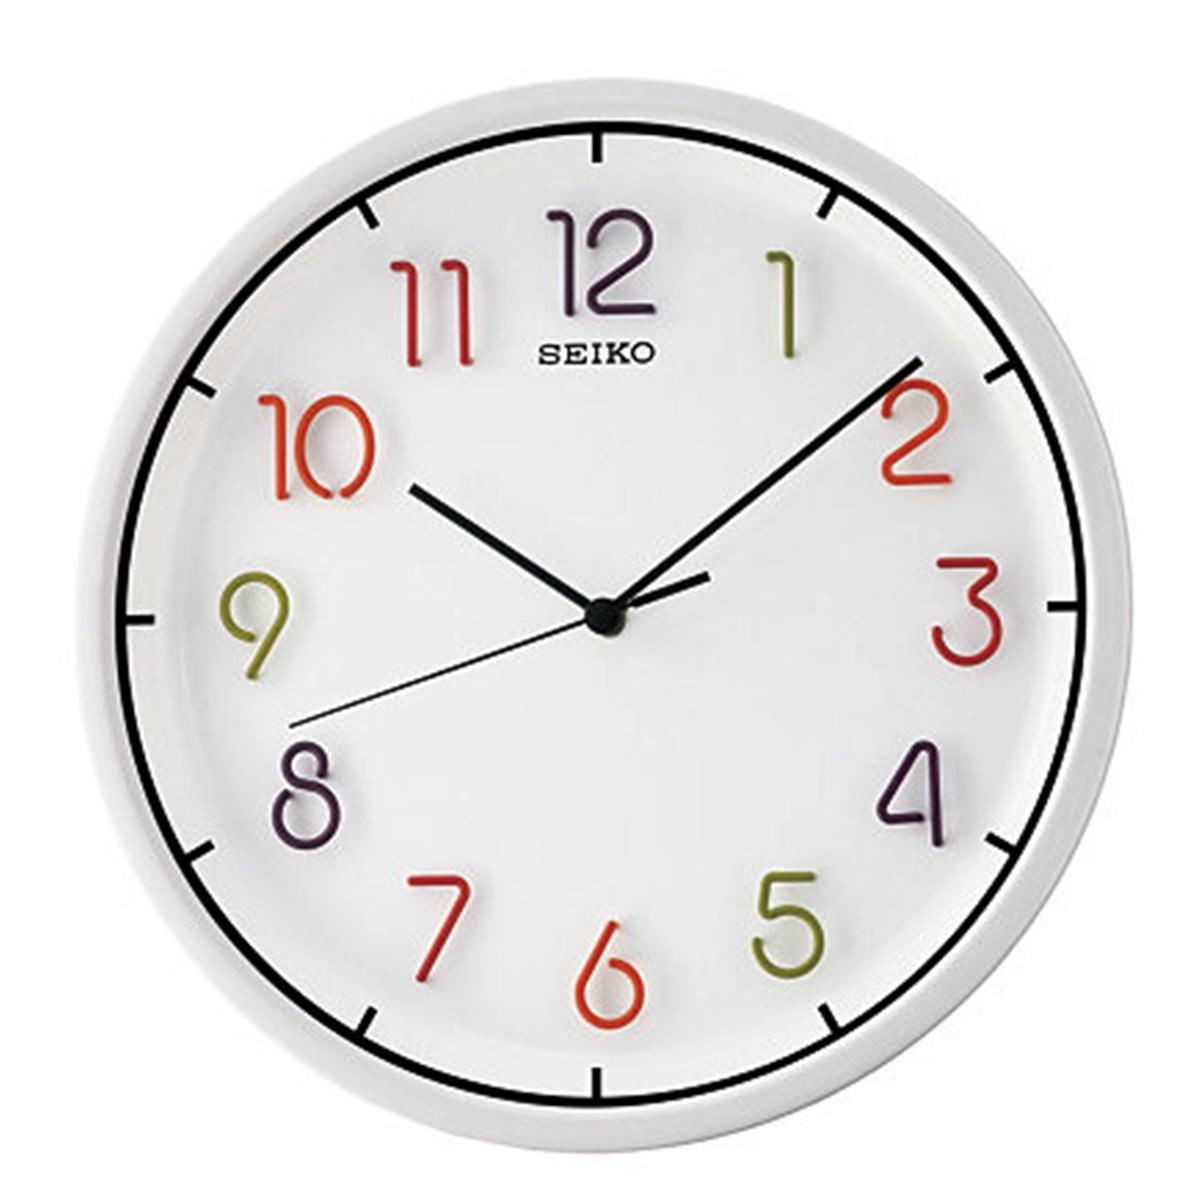 Buy seiko wall clock 318 cm x 318 cm x 45 cm white qxa447hn buy seiko wall clock 318 cm x 318 cm x 45 cm white qxa447hn online at low prices in india amazon amipublicfo Gallery